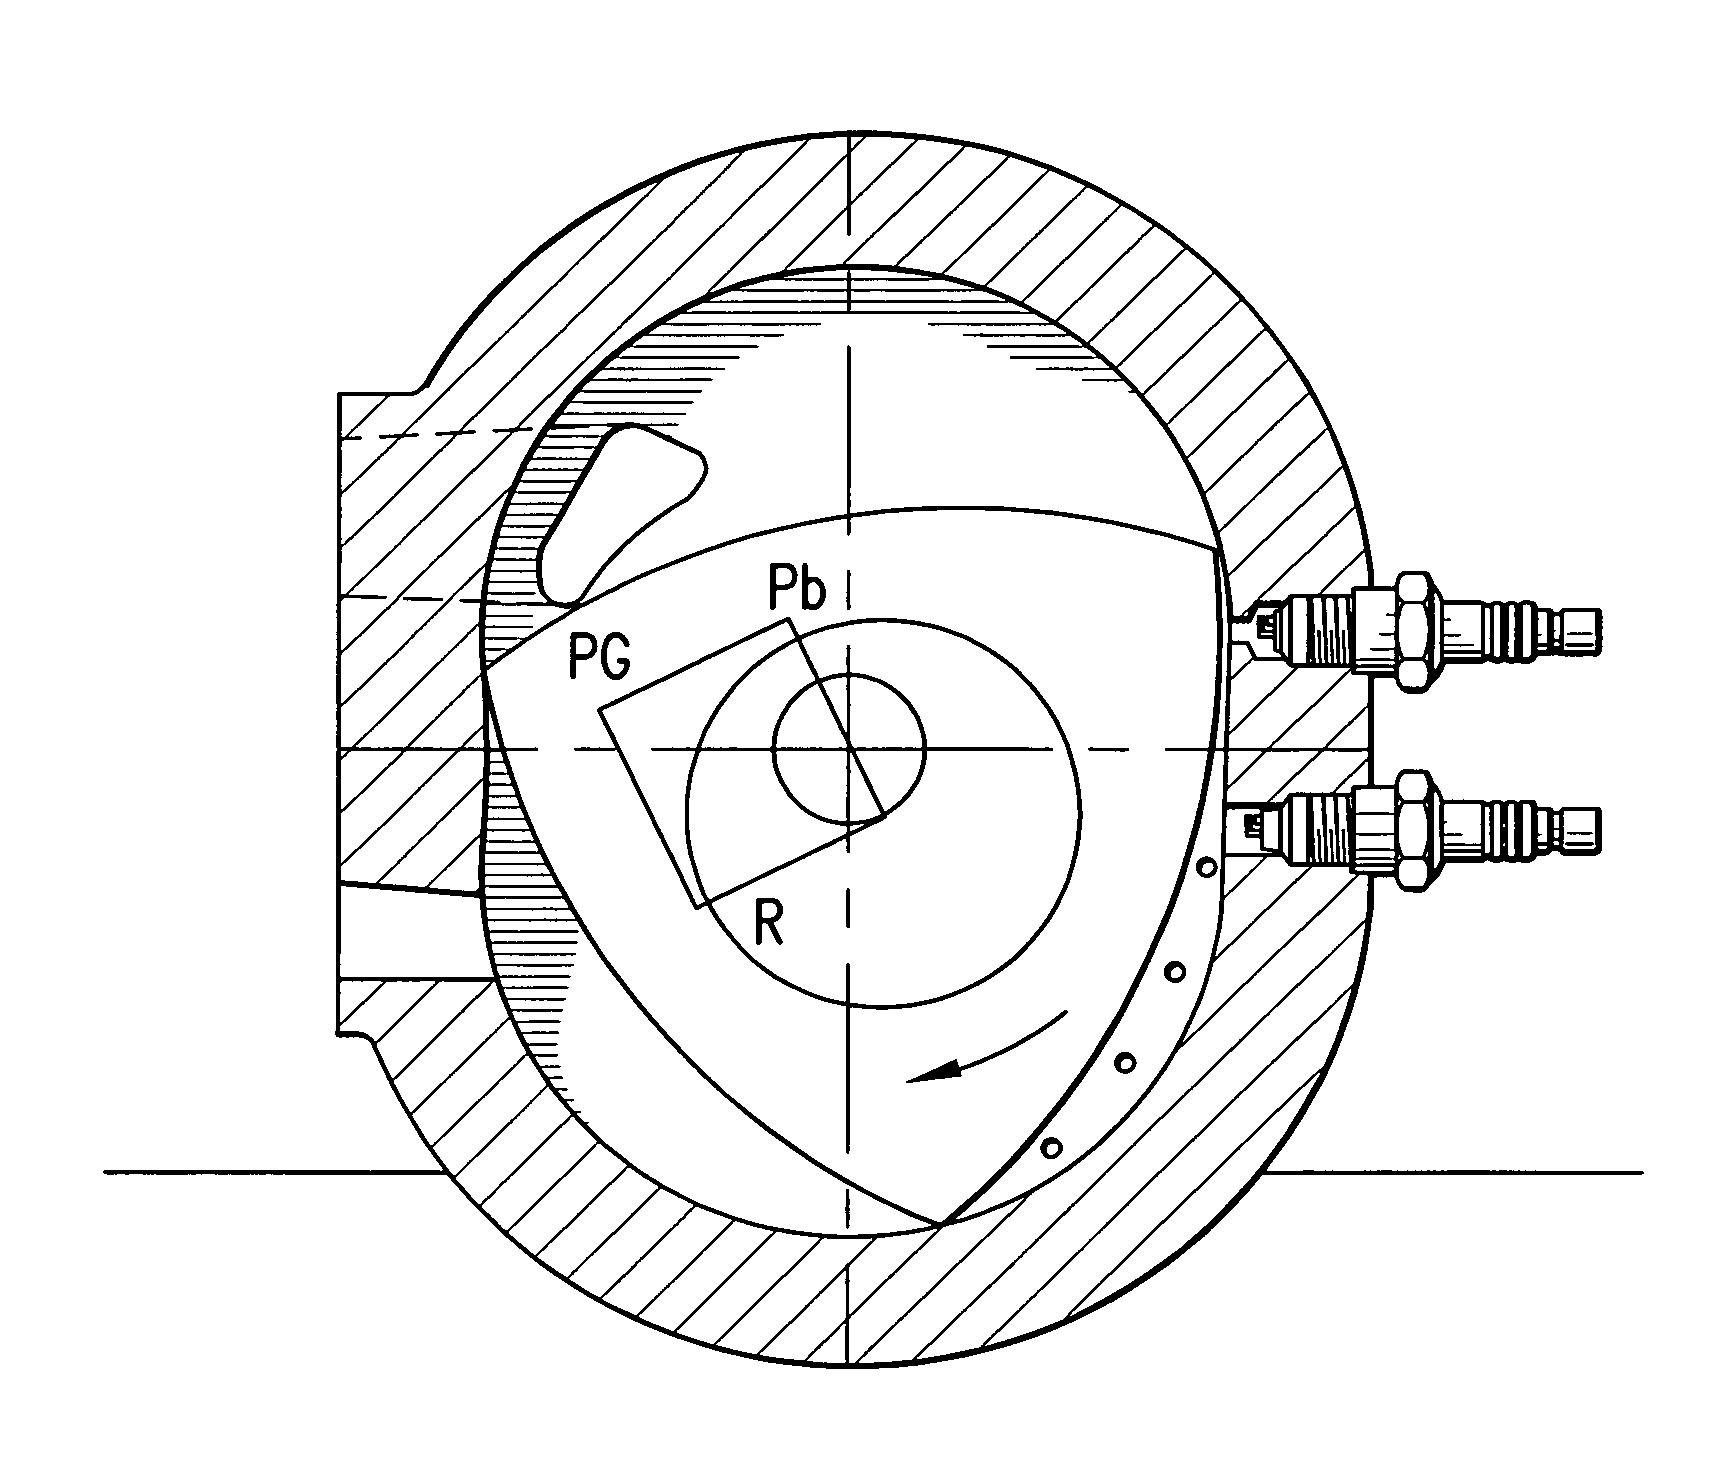 13b rotary engine diagram new wiring diagram 2018